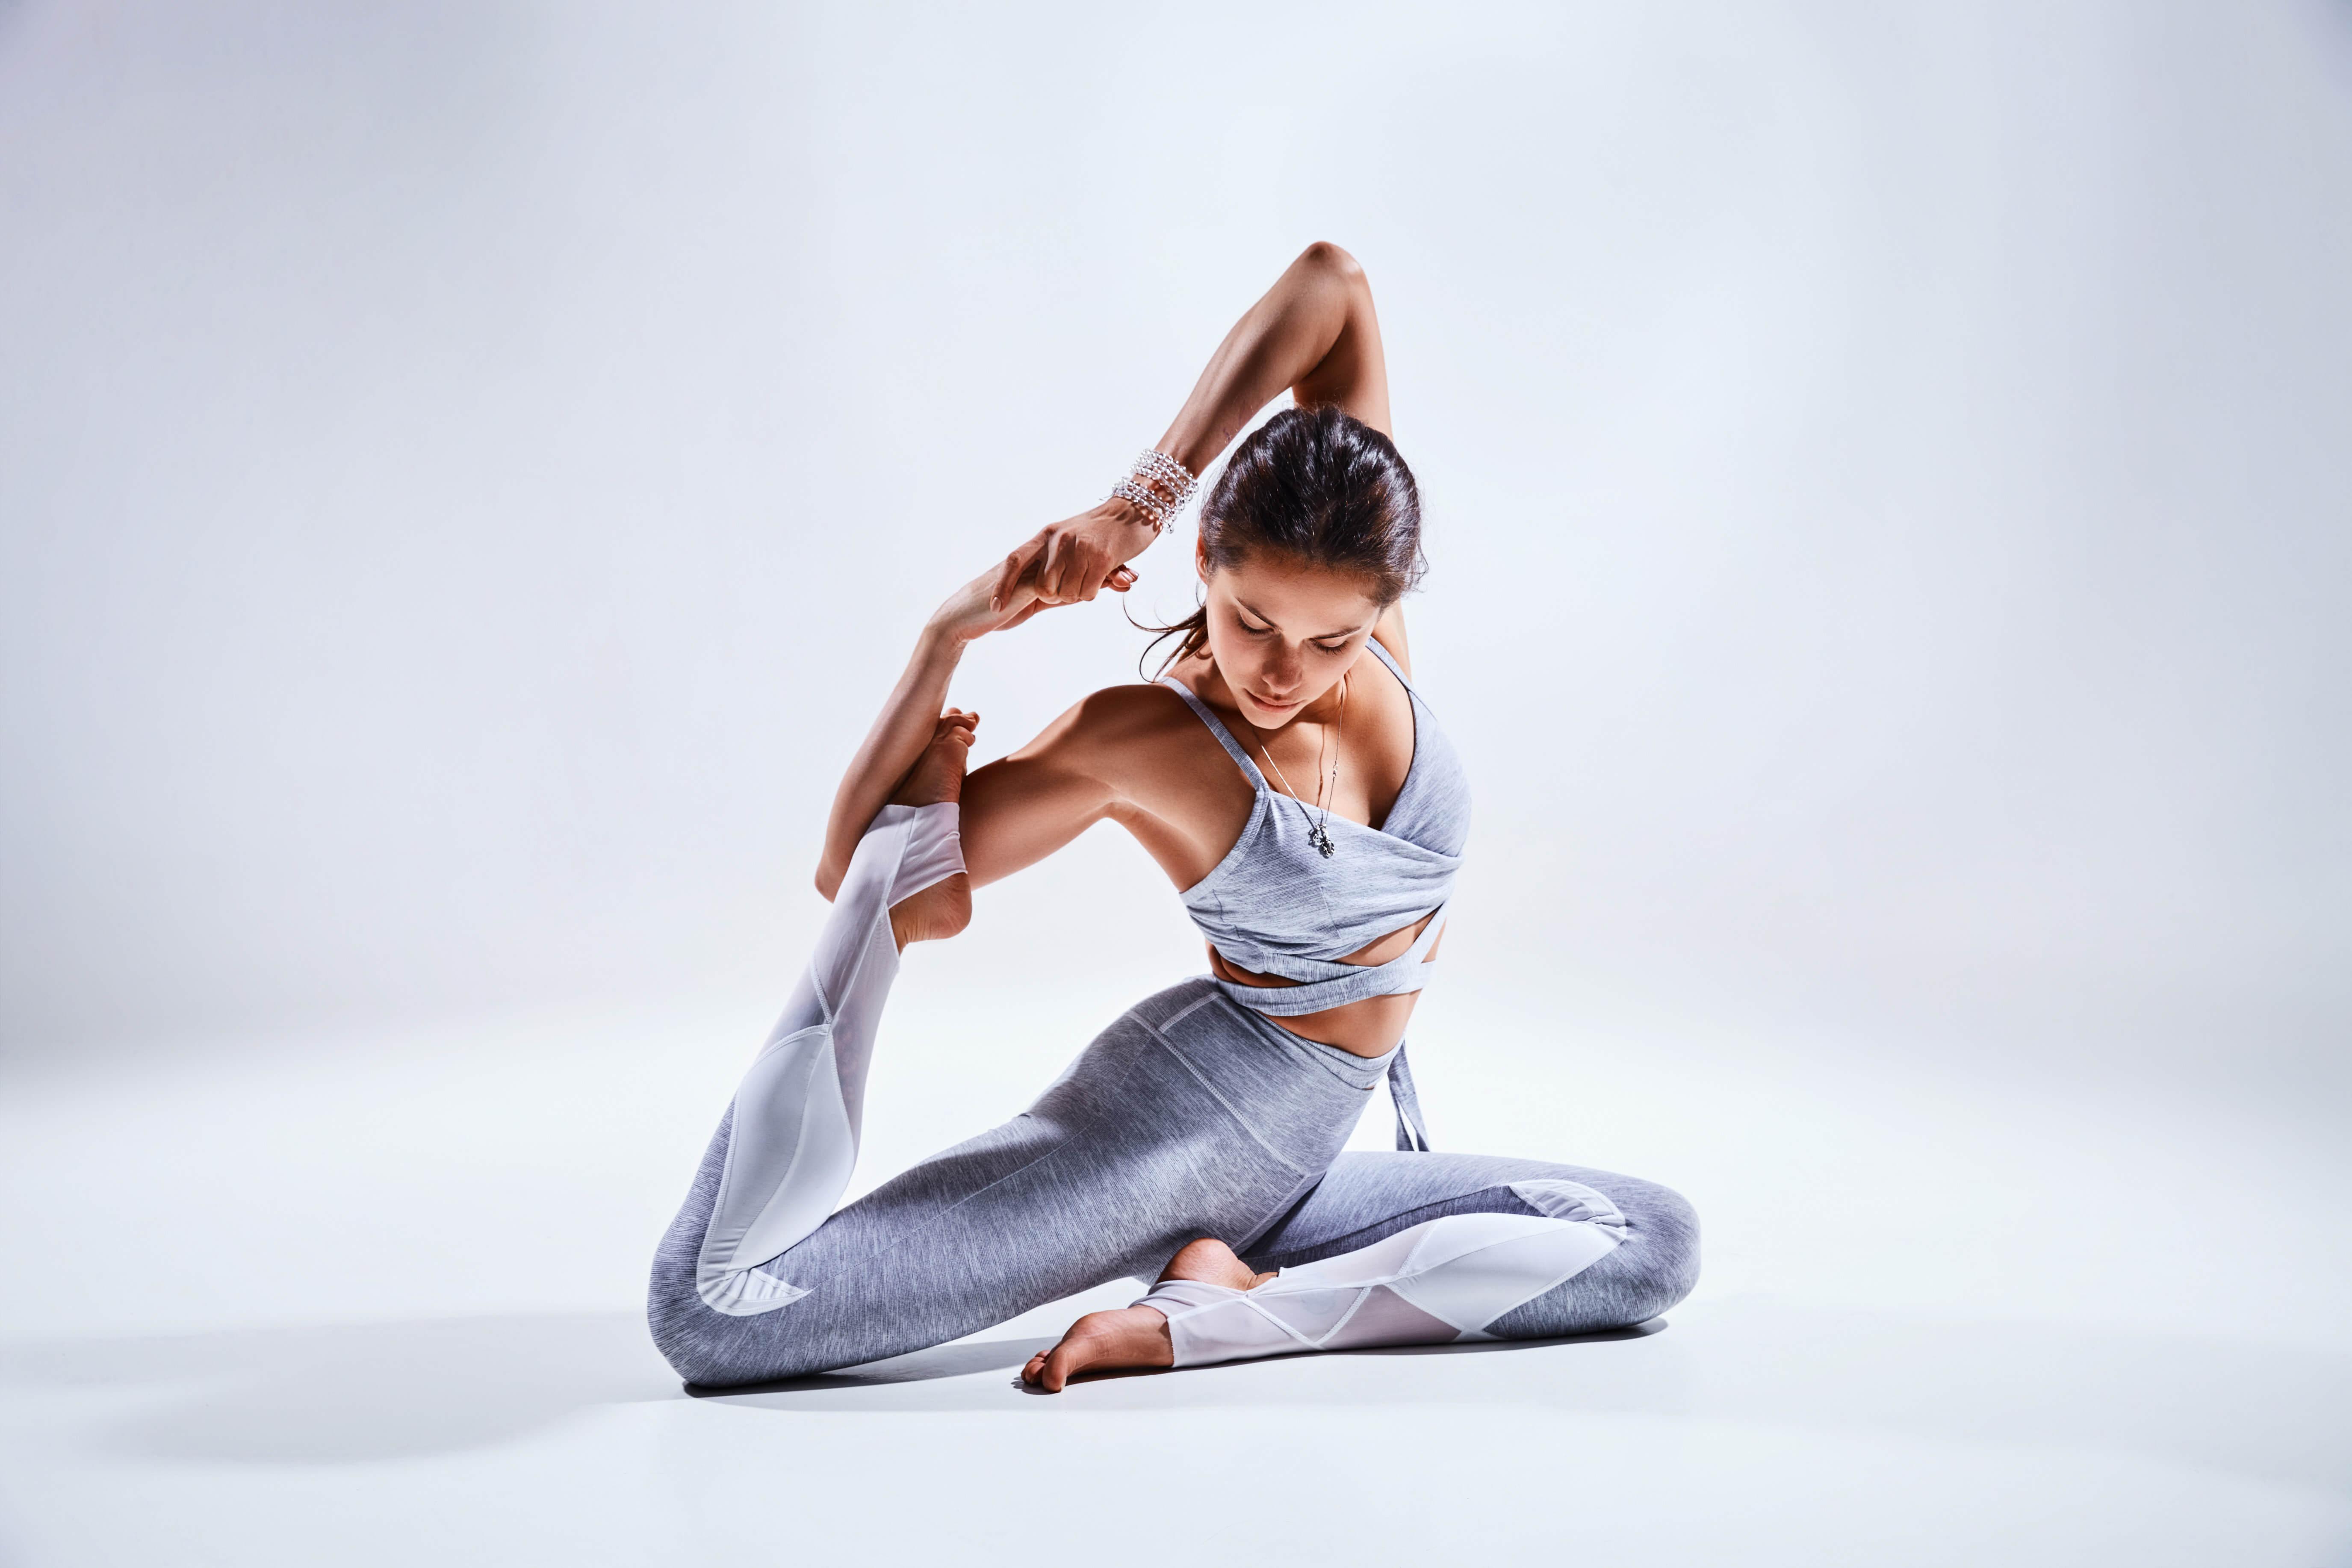 5 steps to flexibility amn academy